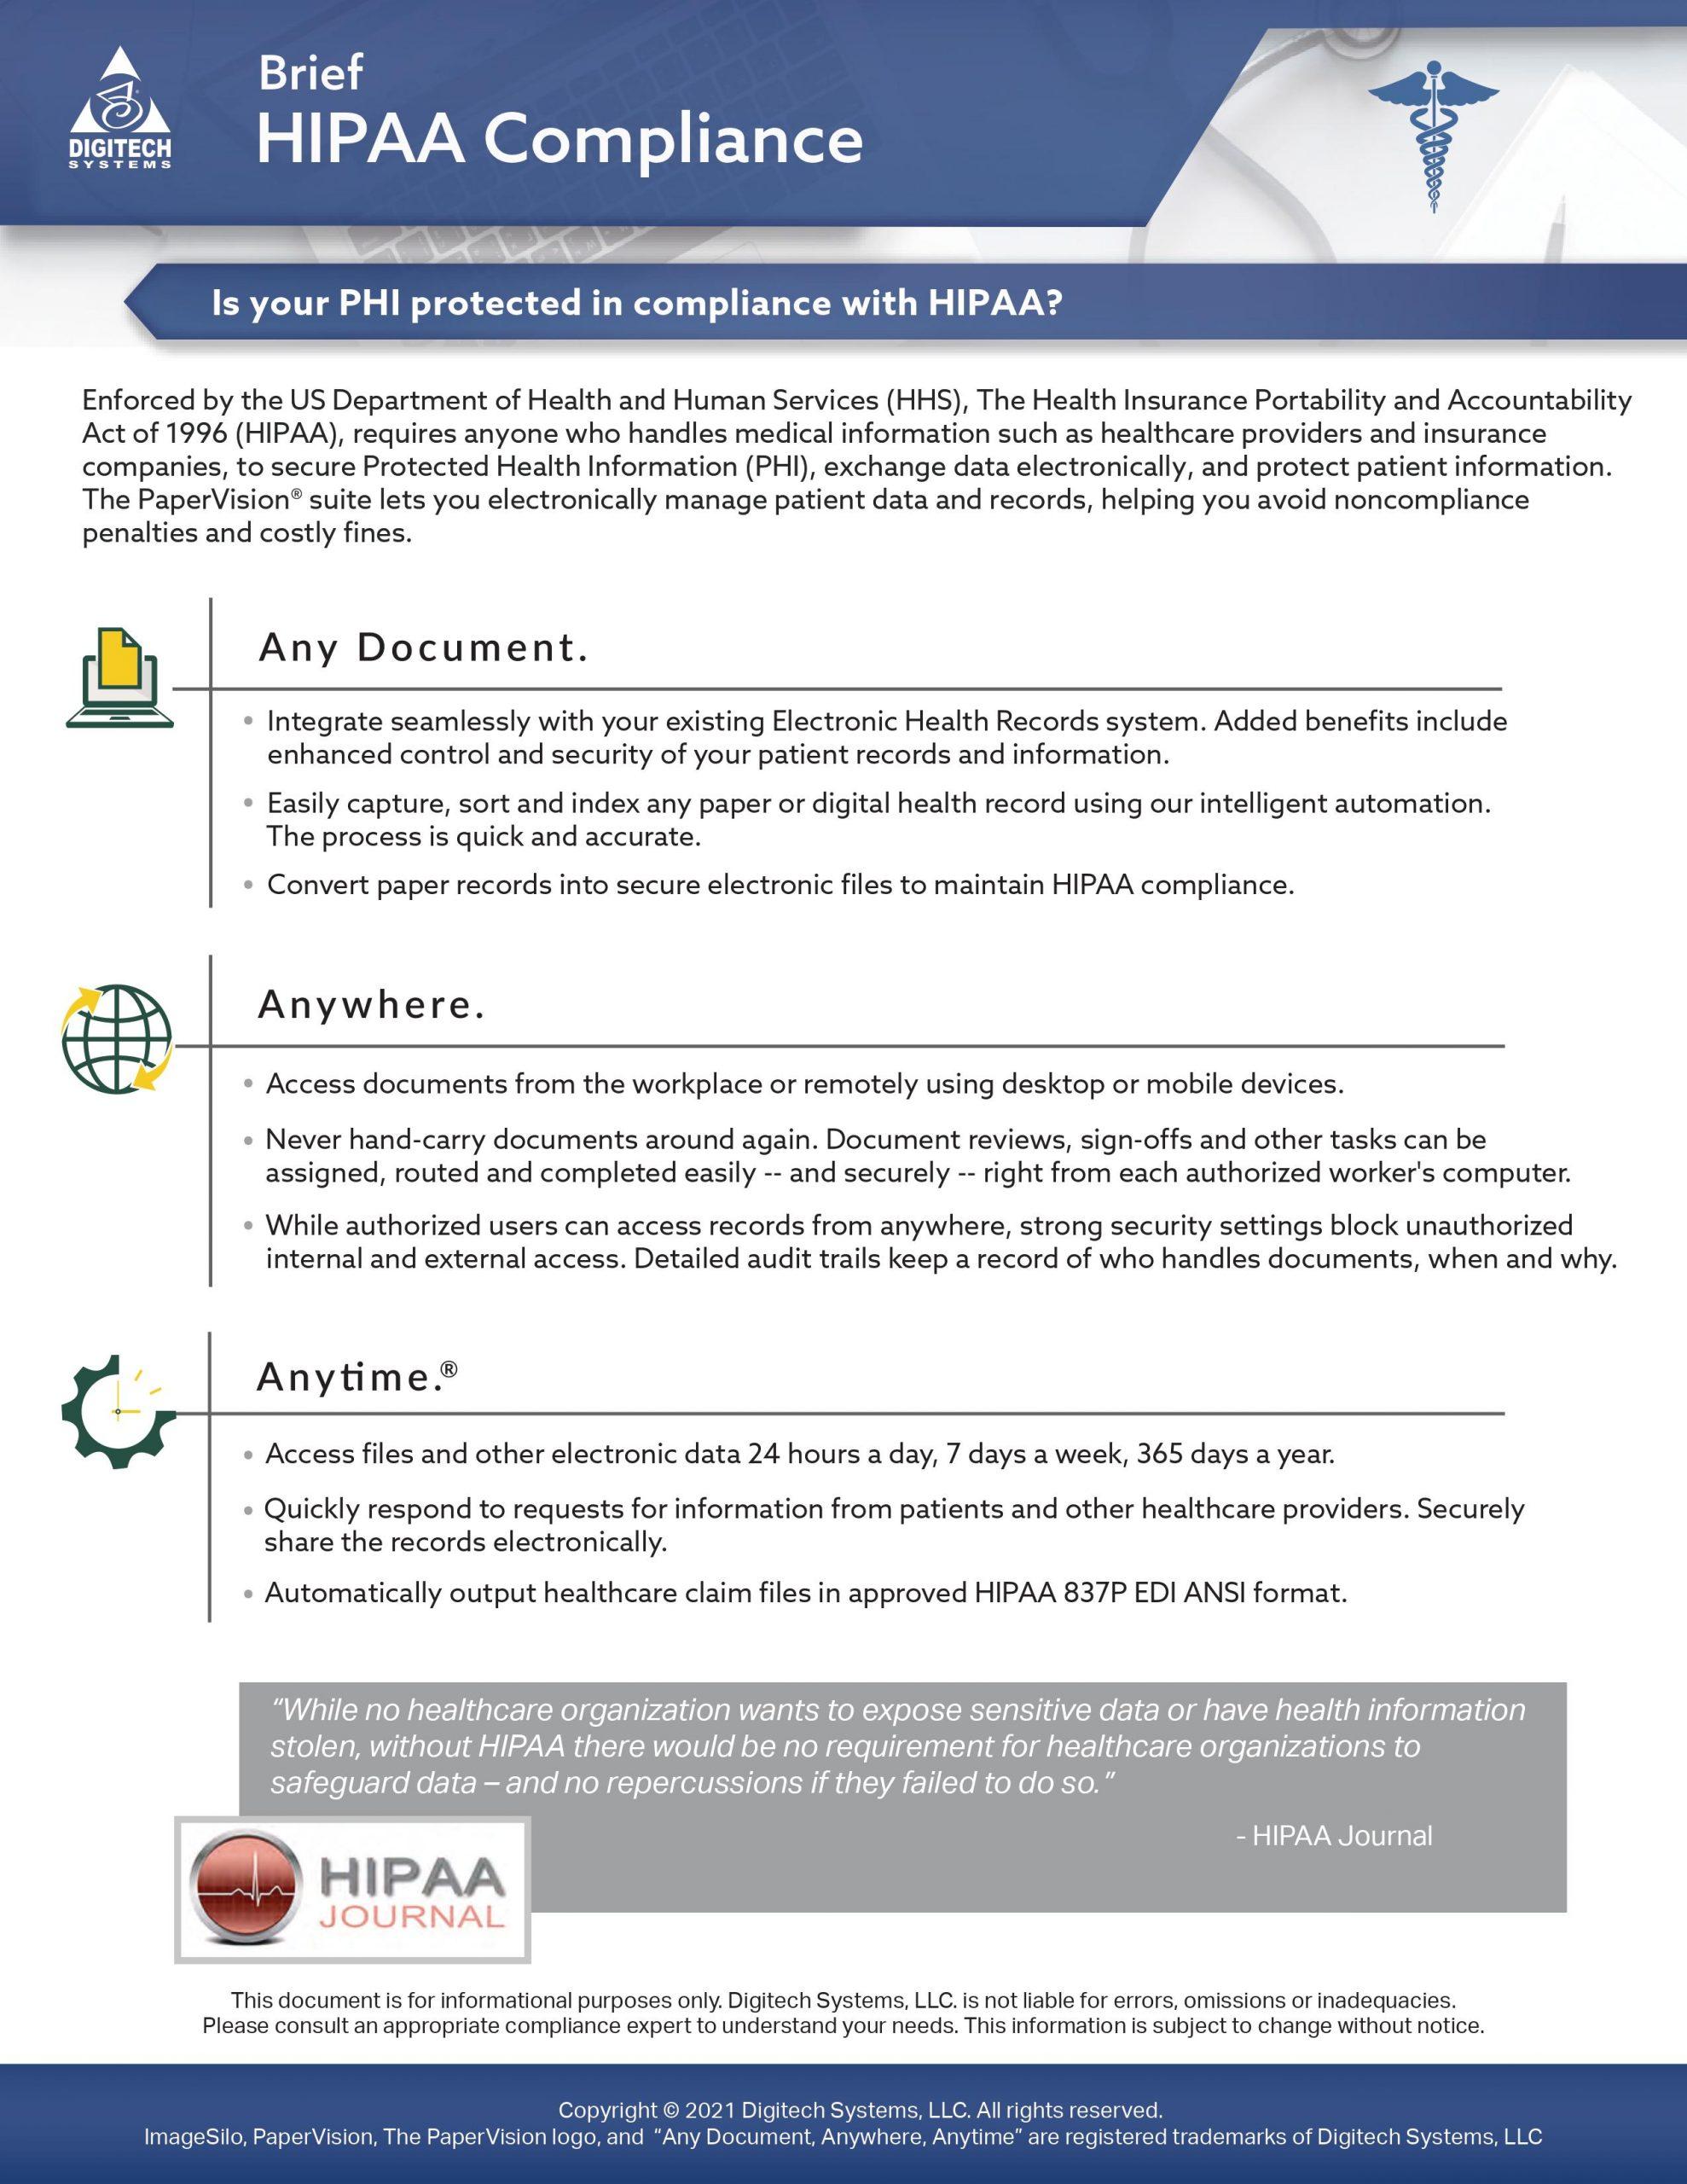 hipaa compliance brief - product image